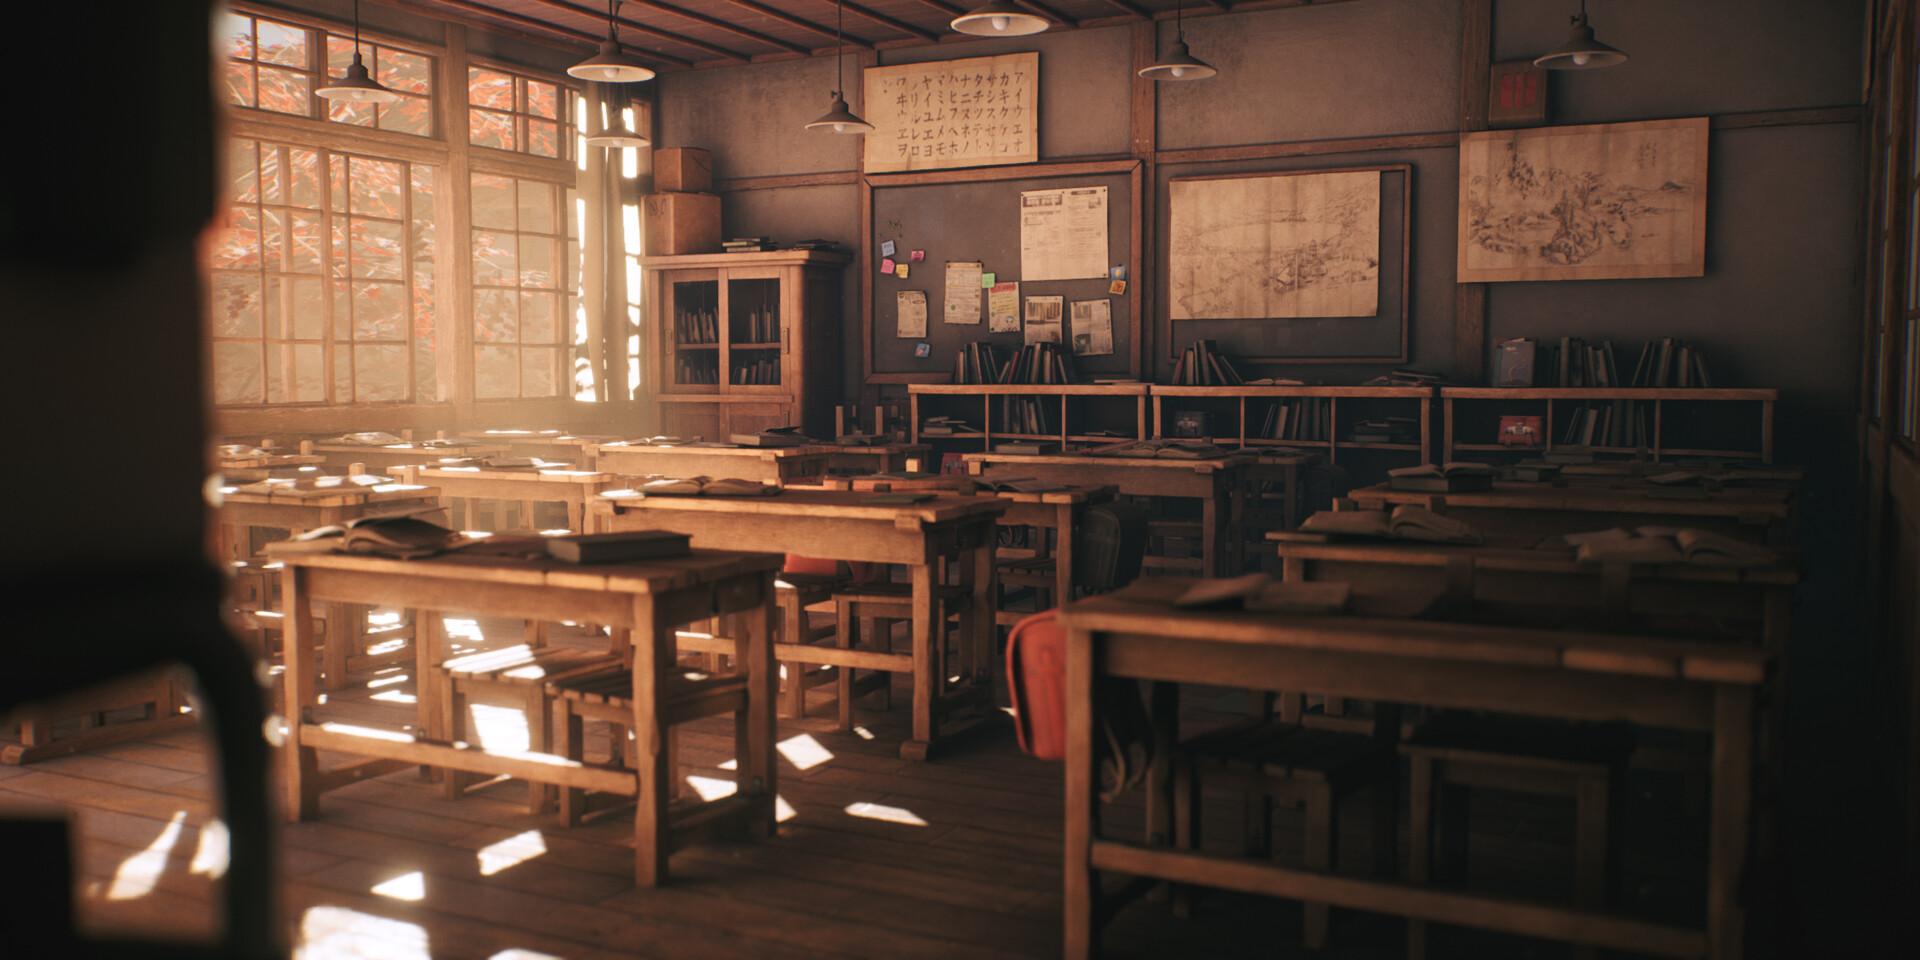 Agancg_UE4_tutorial_Old-Japanese-Classroom05